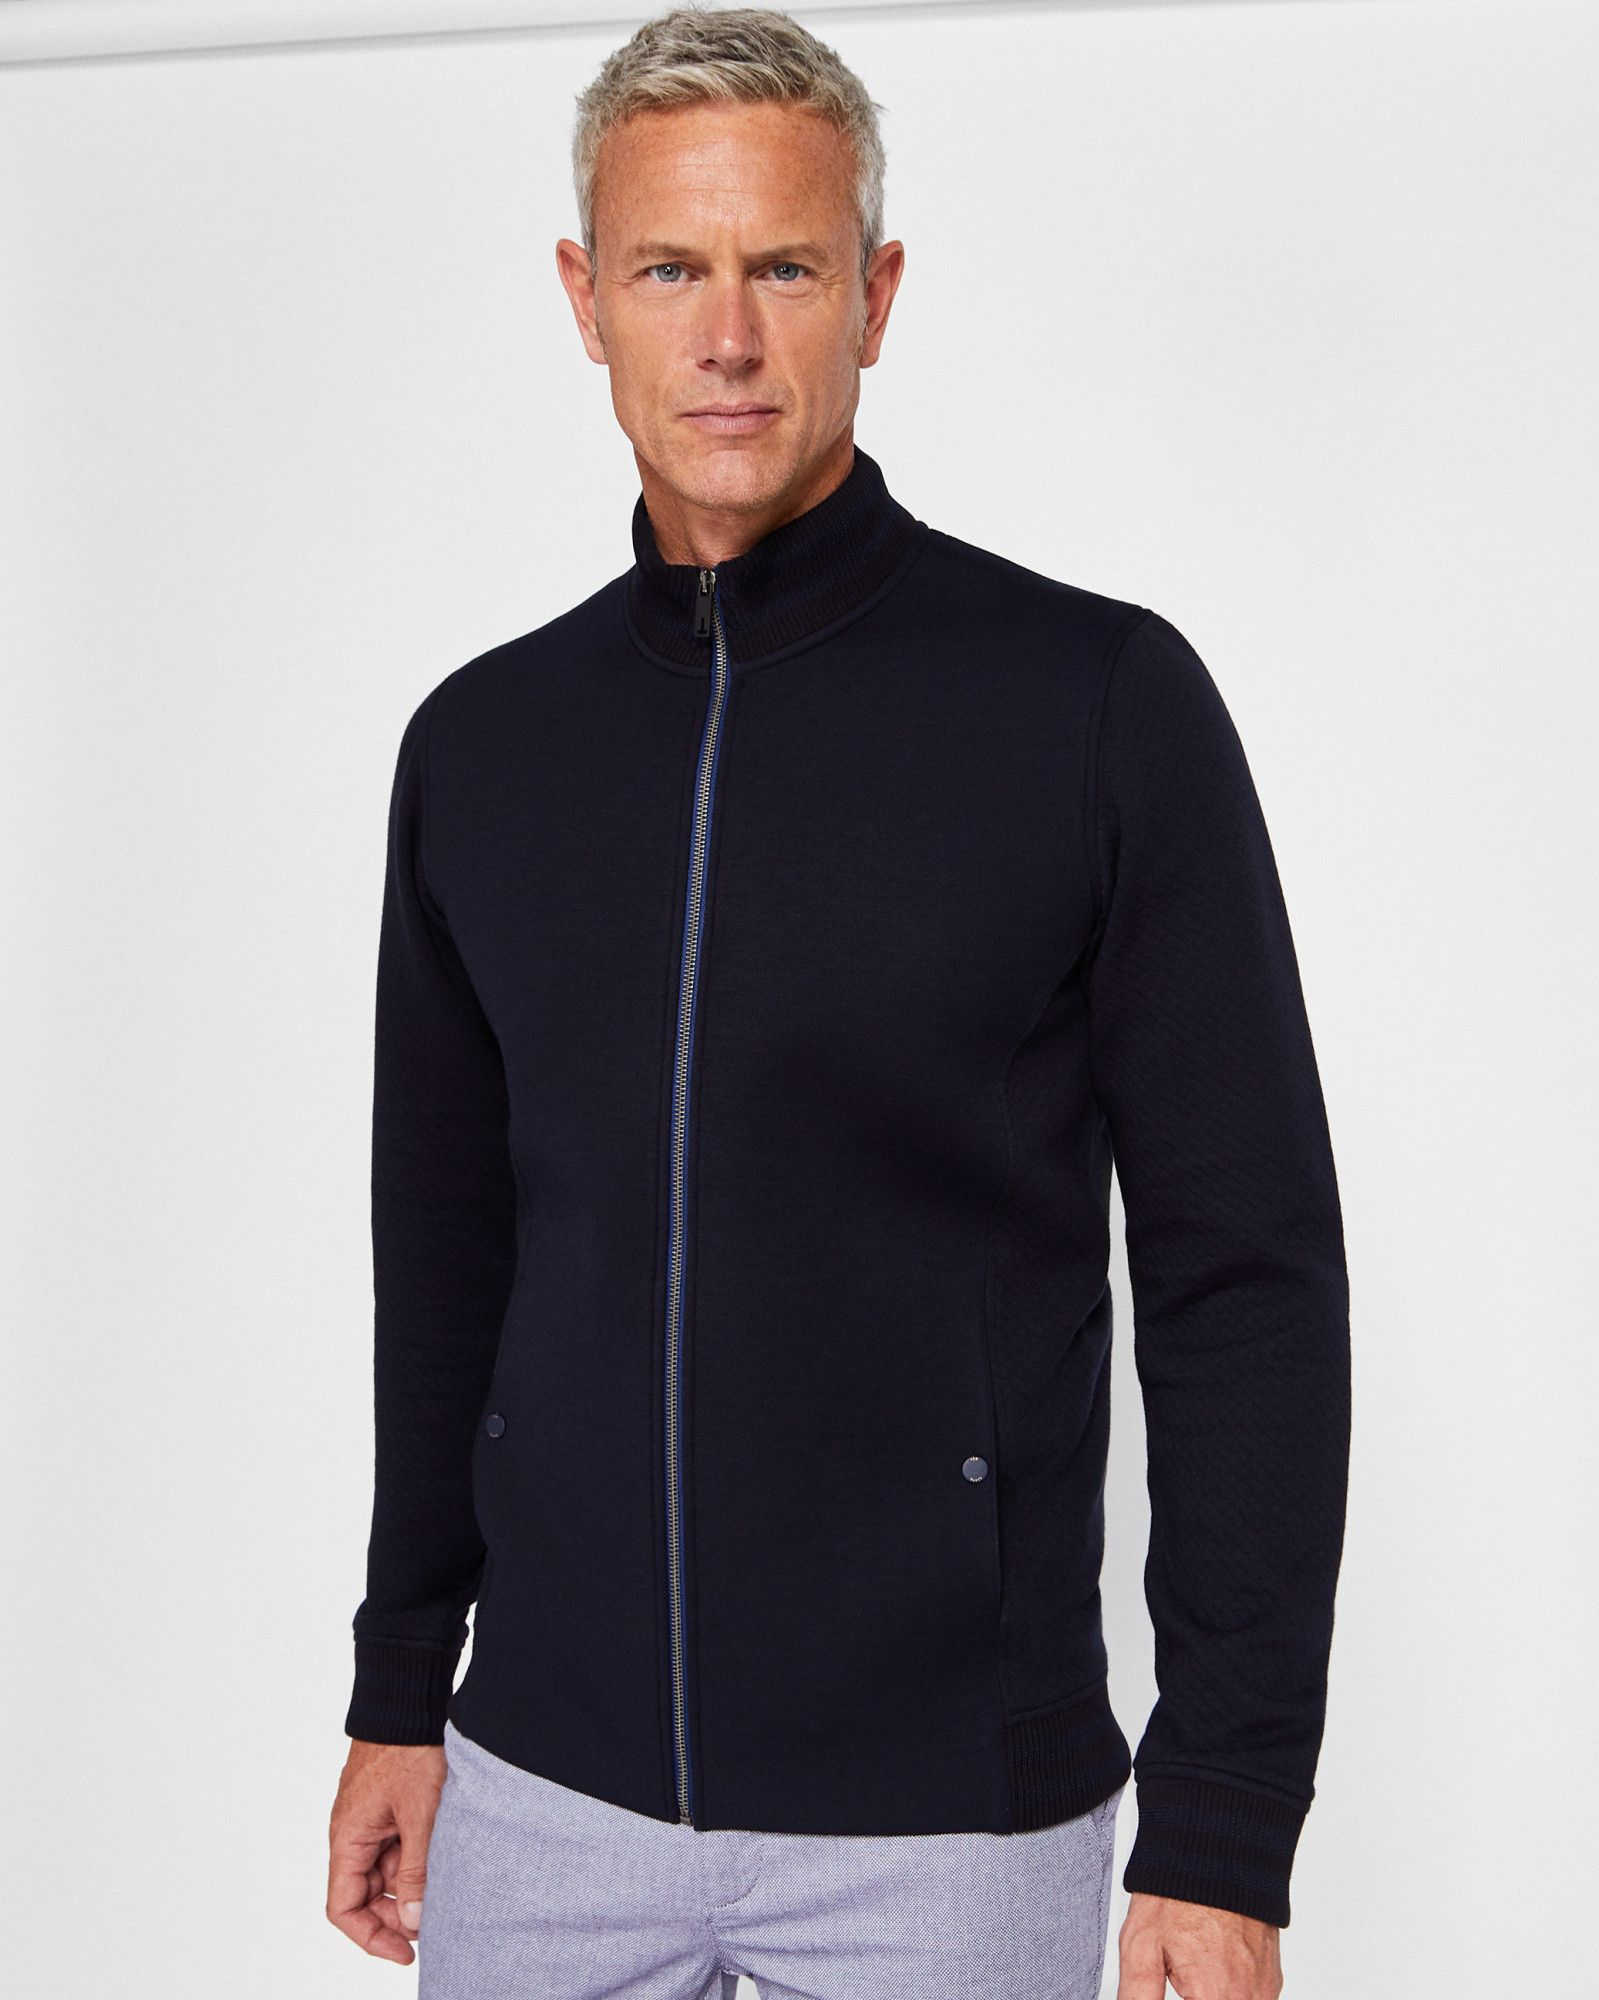 Ted Baker Neoprene Bomber Jacket Navy Designer Clothes For Men Mens Outfits Clothes Design [ 2000 x 1599 Pixel ]